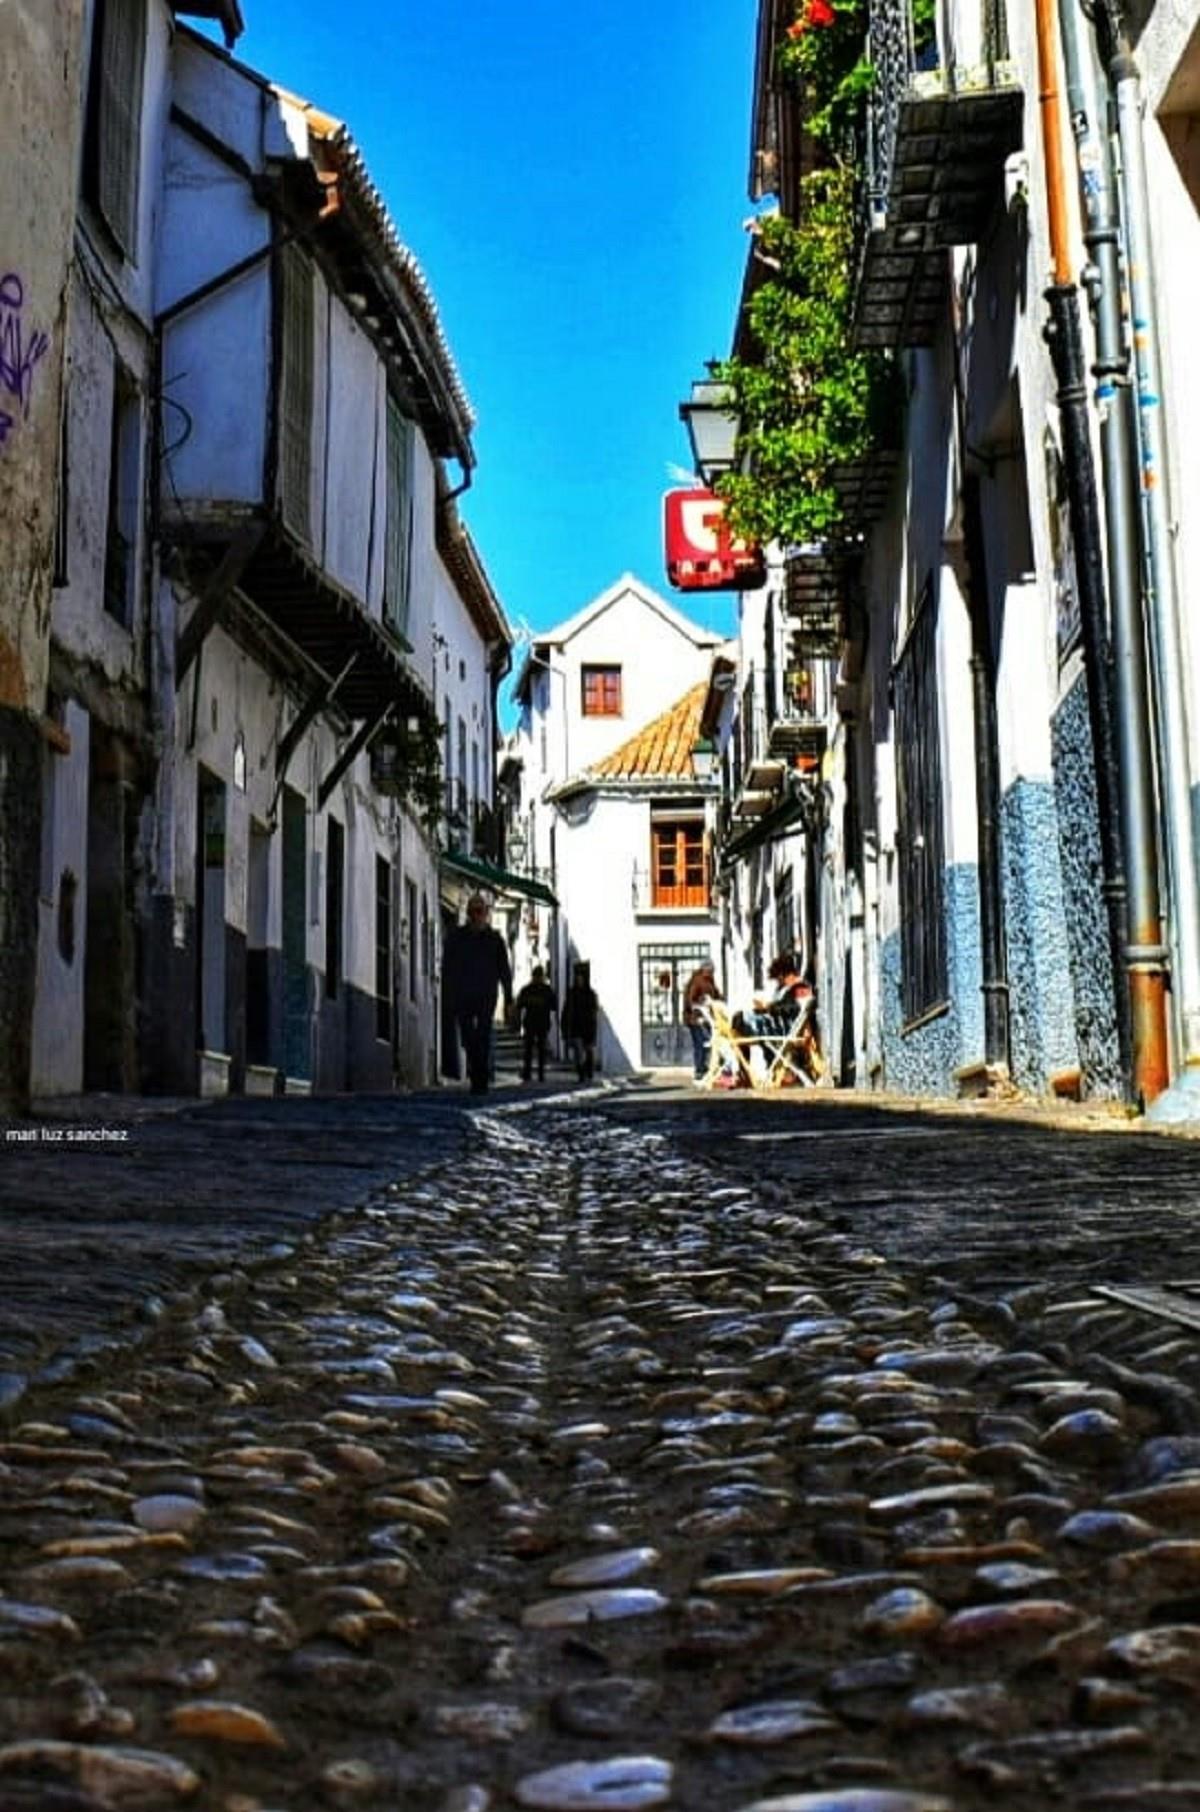 Albaicín-Sacromonte Free Tour